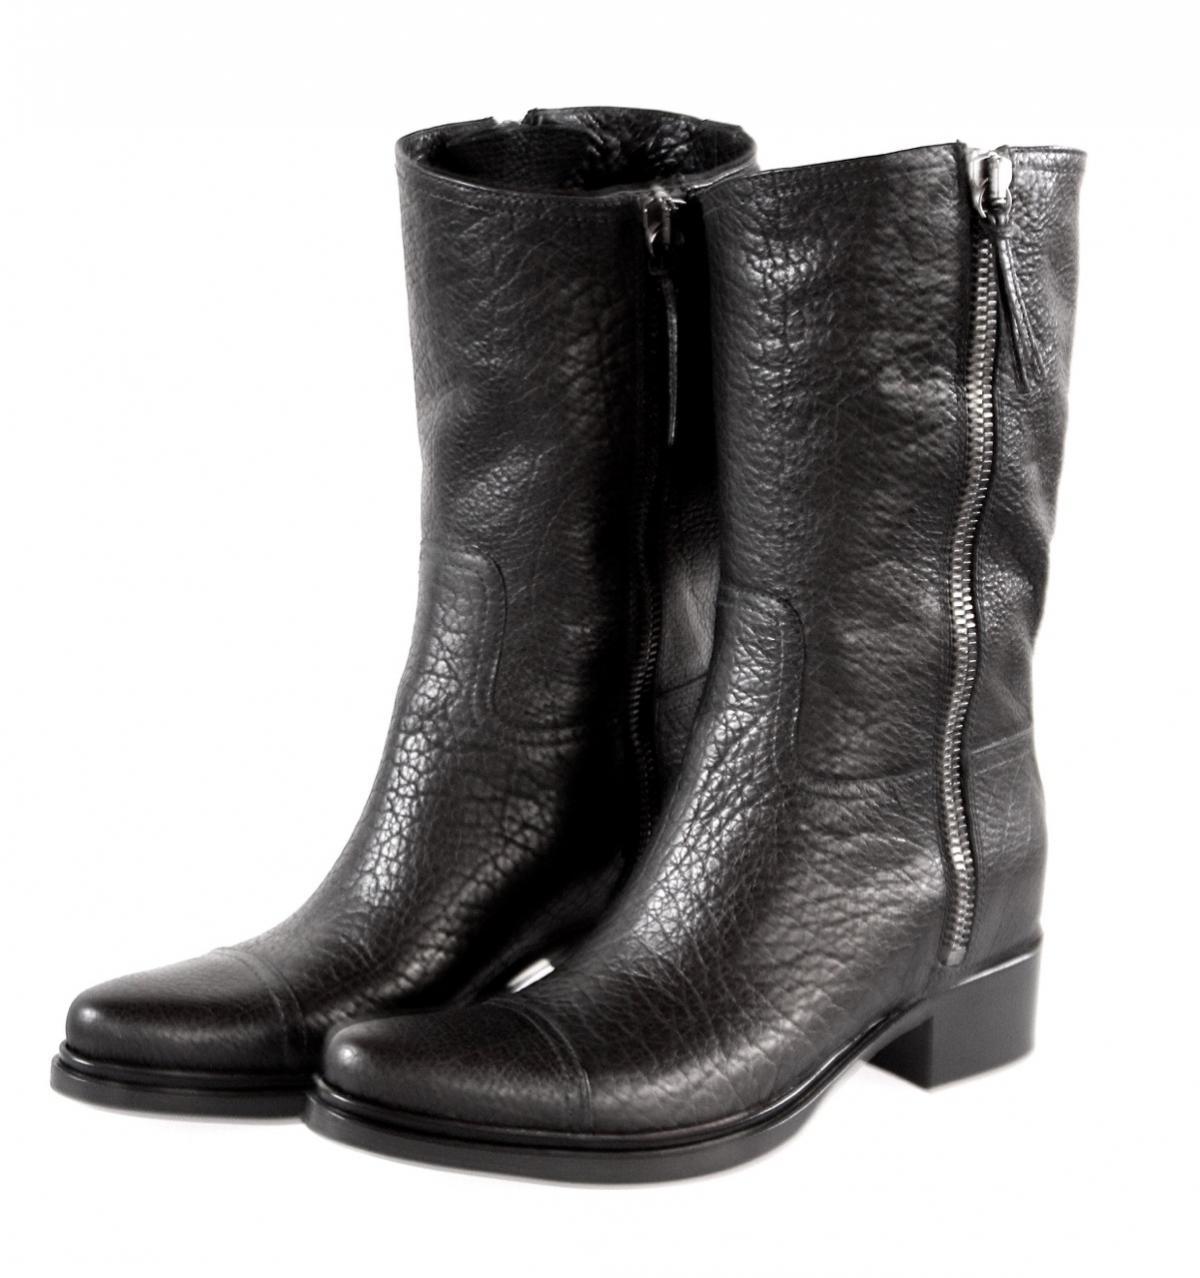 luxury miu miu by prada boots 5u8936 black buffalo new nib us 7 5 eu 37 5 38 ebay. Black Bedroom Furniture Sets. Home Design Ideas